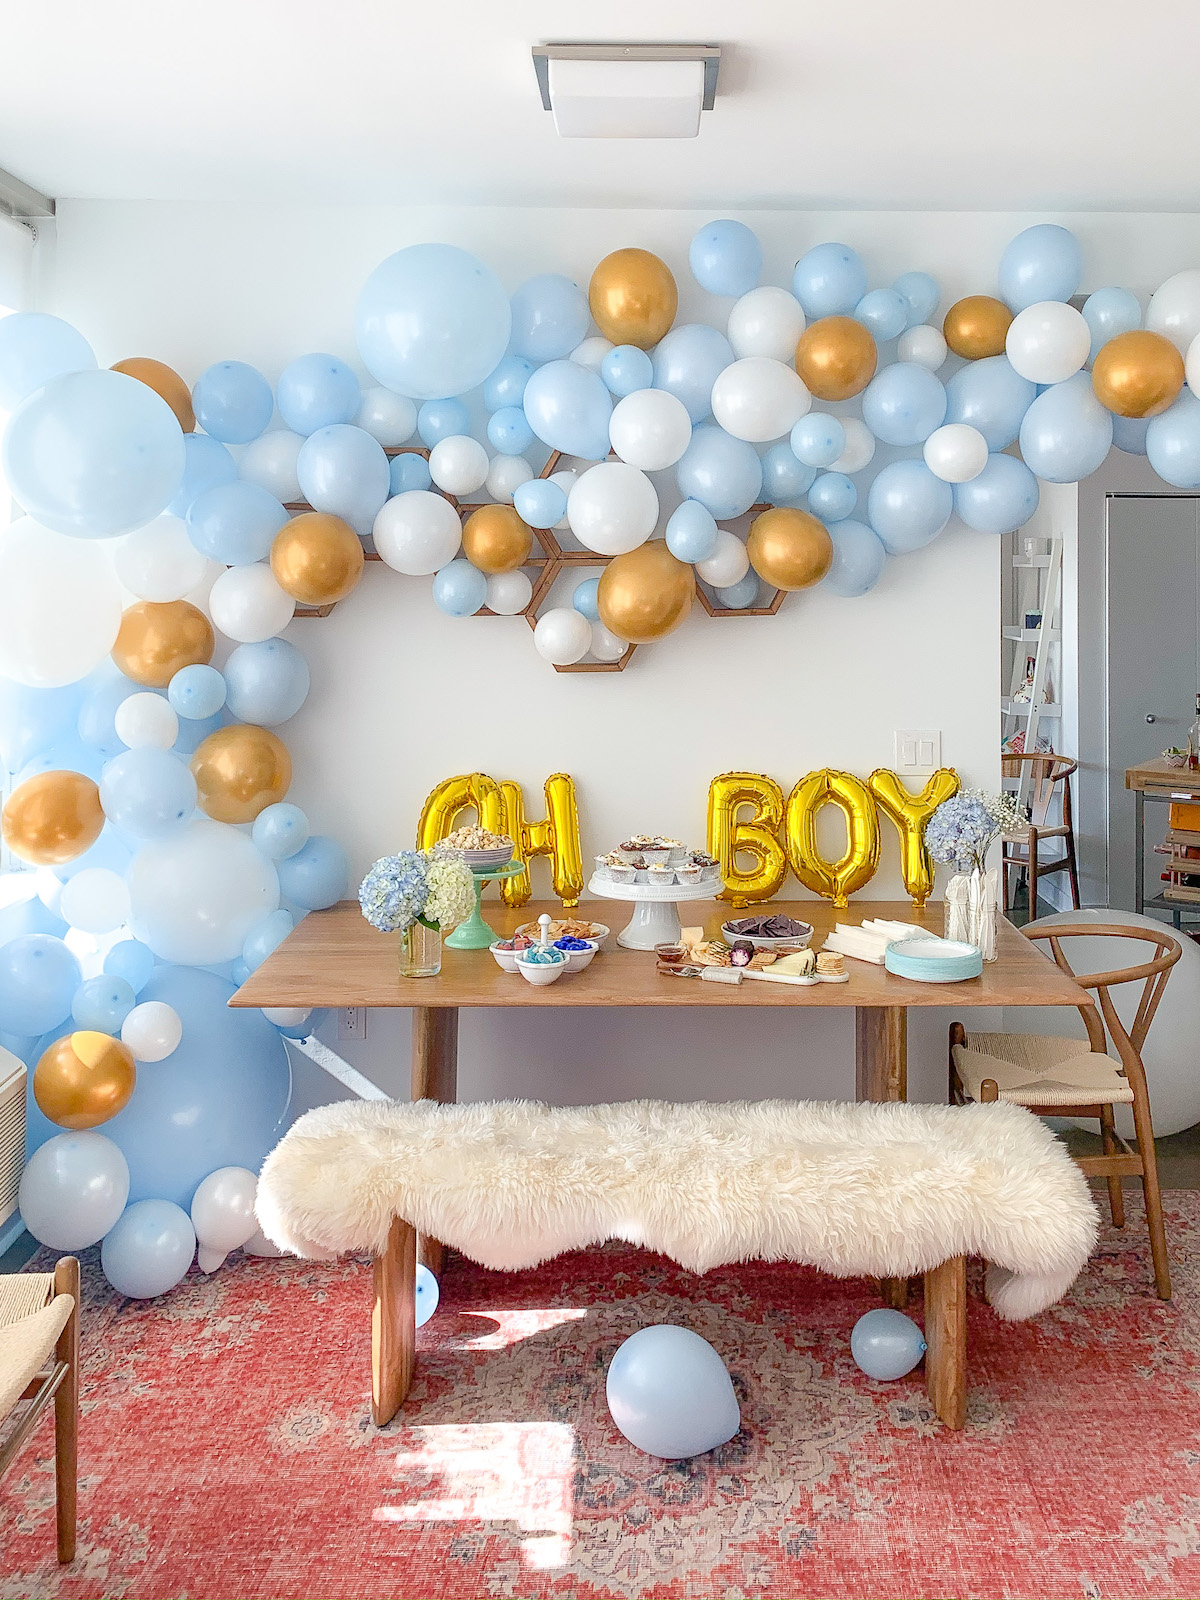 Katies Bliss Gender Reveal Party